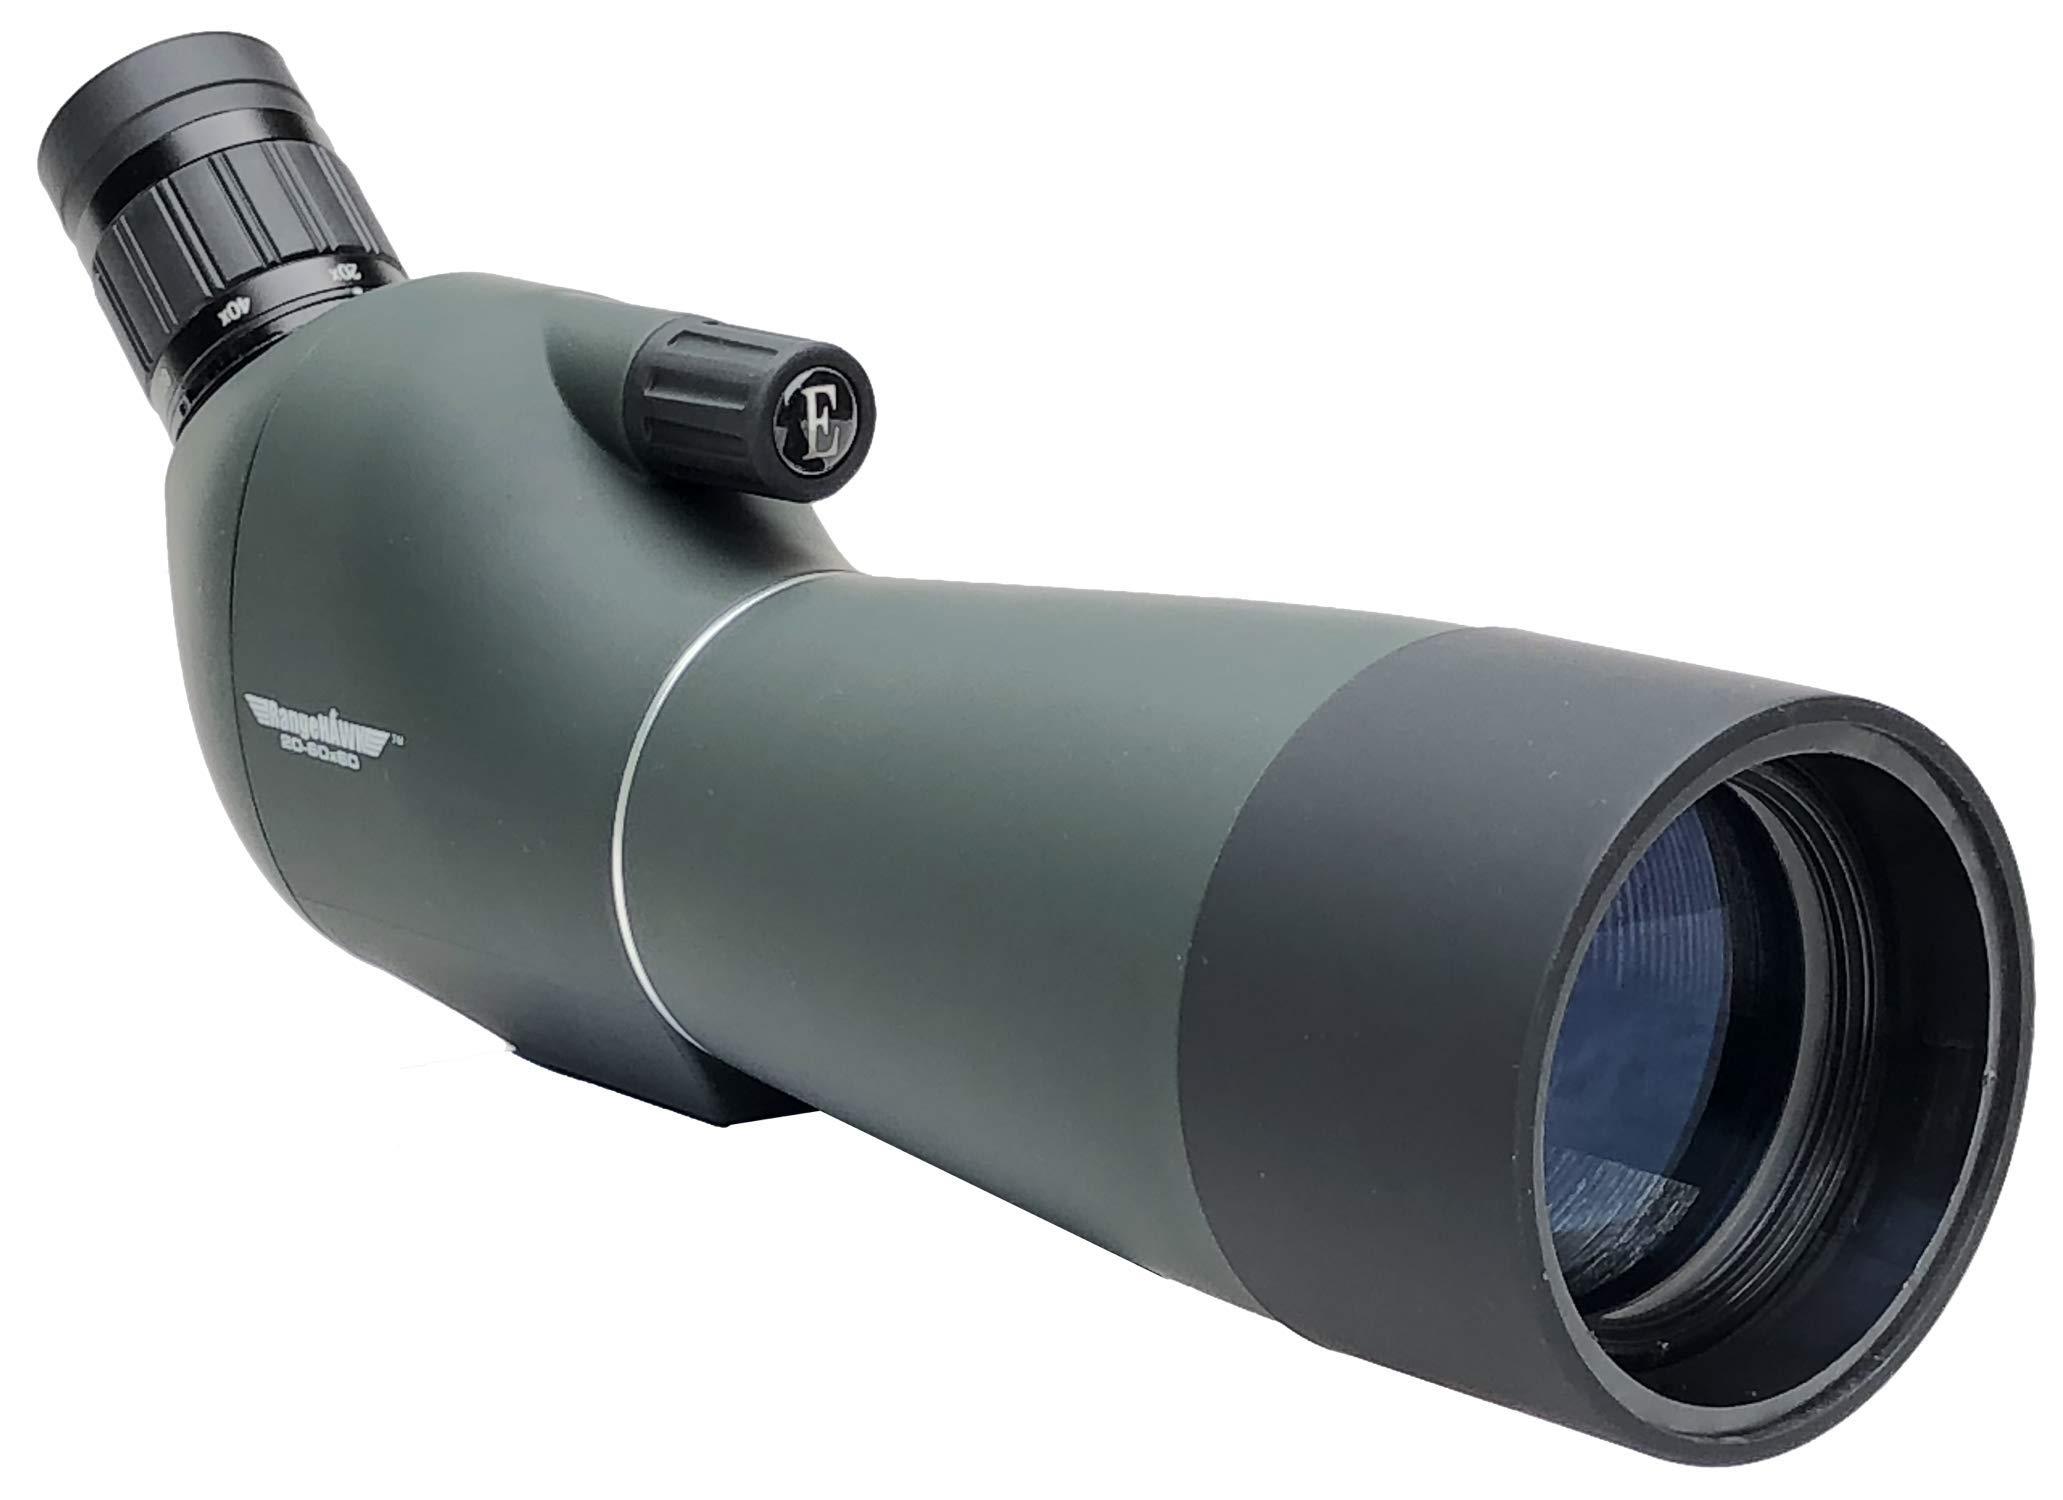 RangeHAWK Target Shooting Spotting Scope (20-60x60), Clear Optics Best for Shooting Range, Hunting, Bird Watching, Archery, Astronomy, Glassing, and More. by RangeHAWK